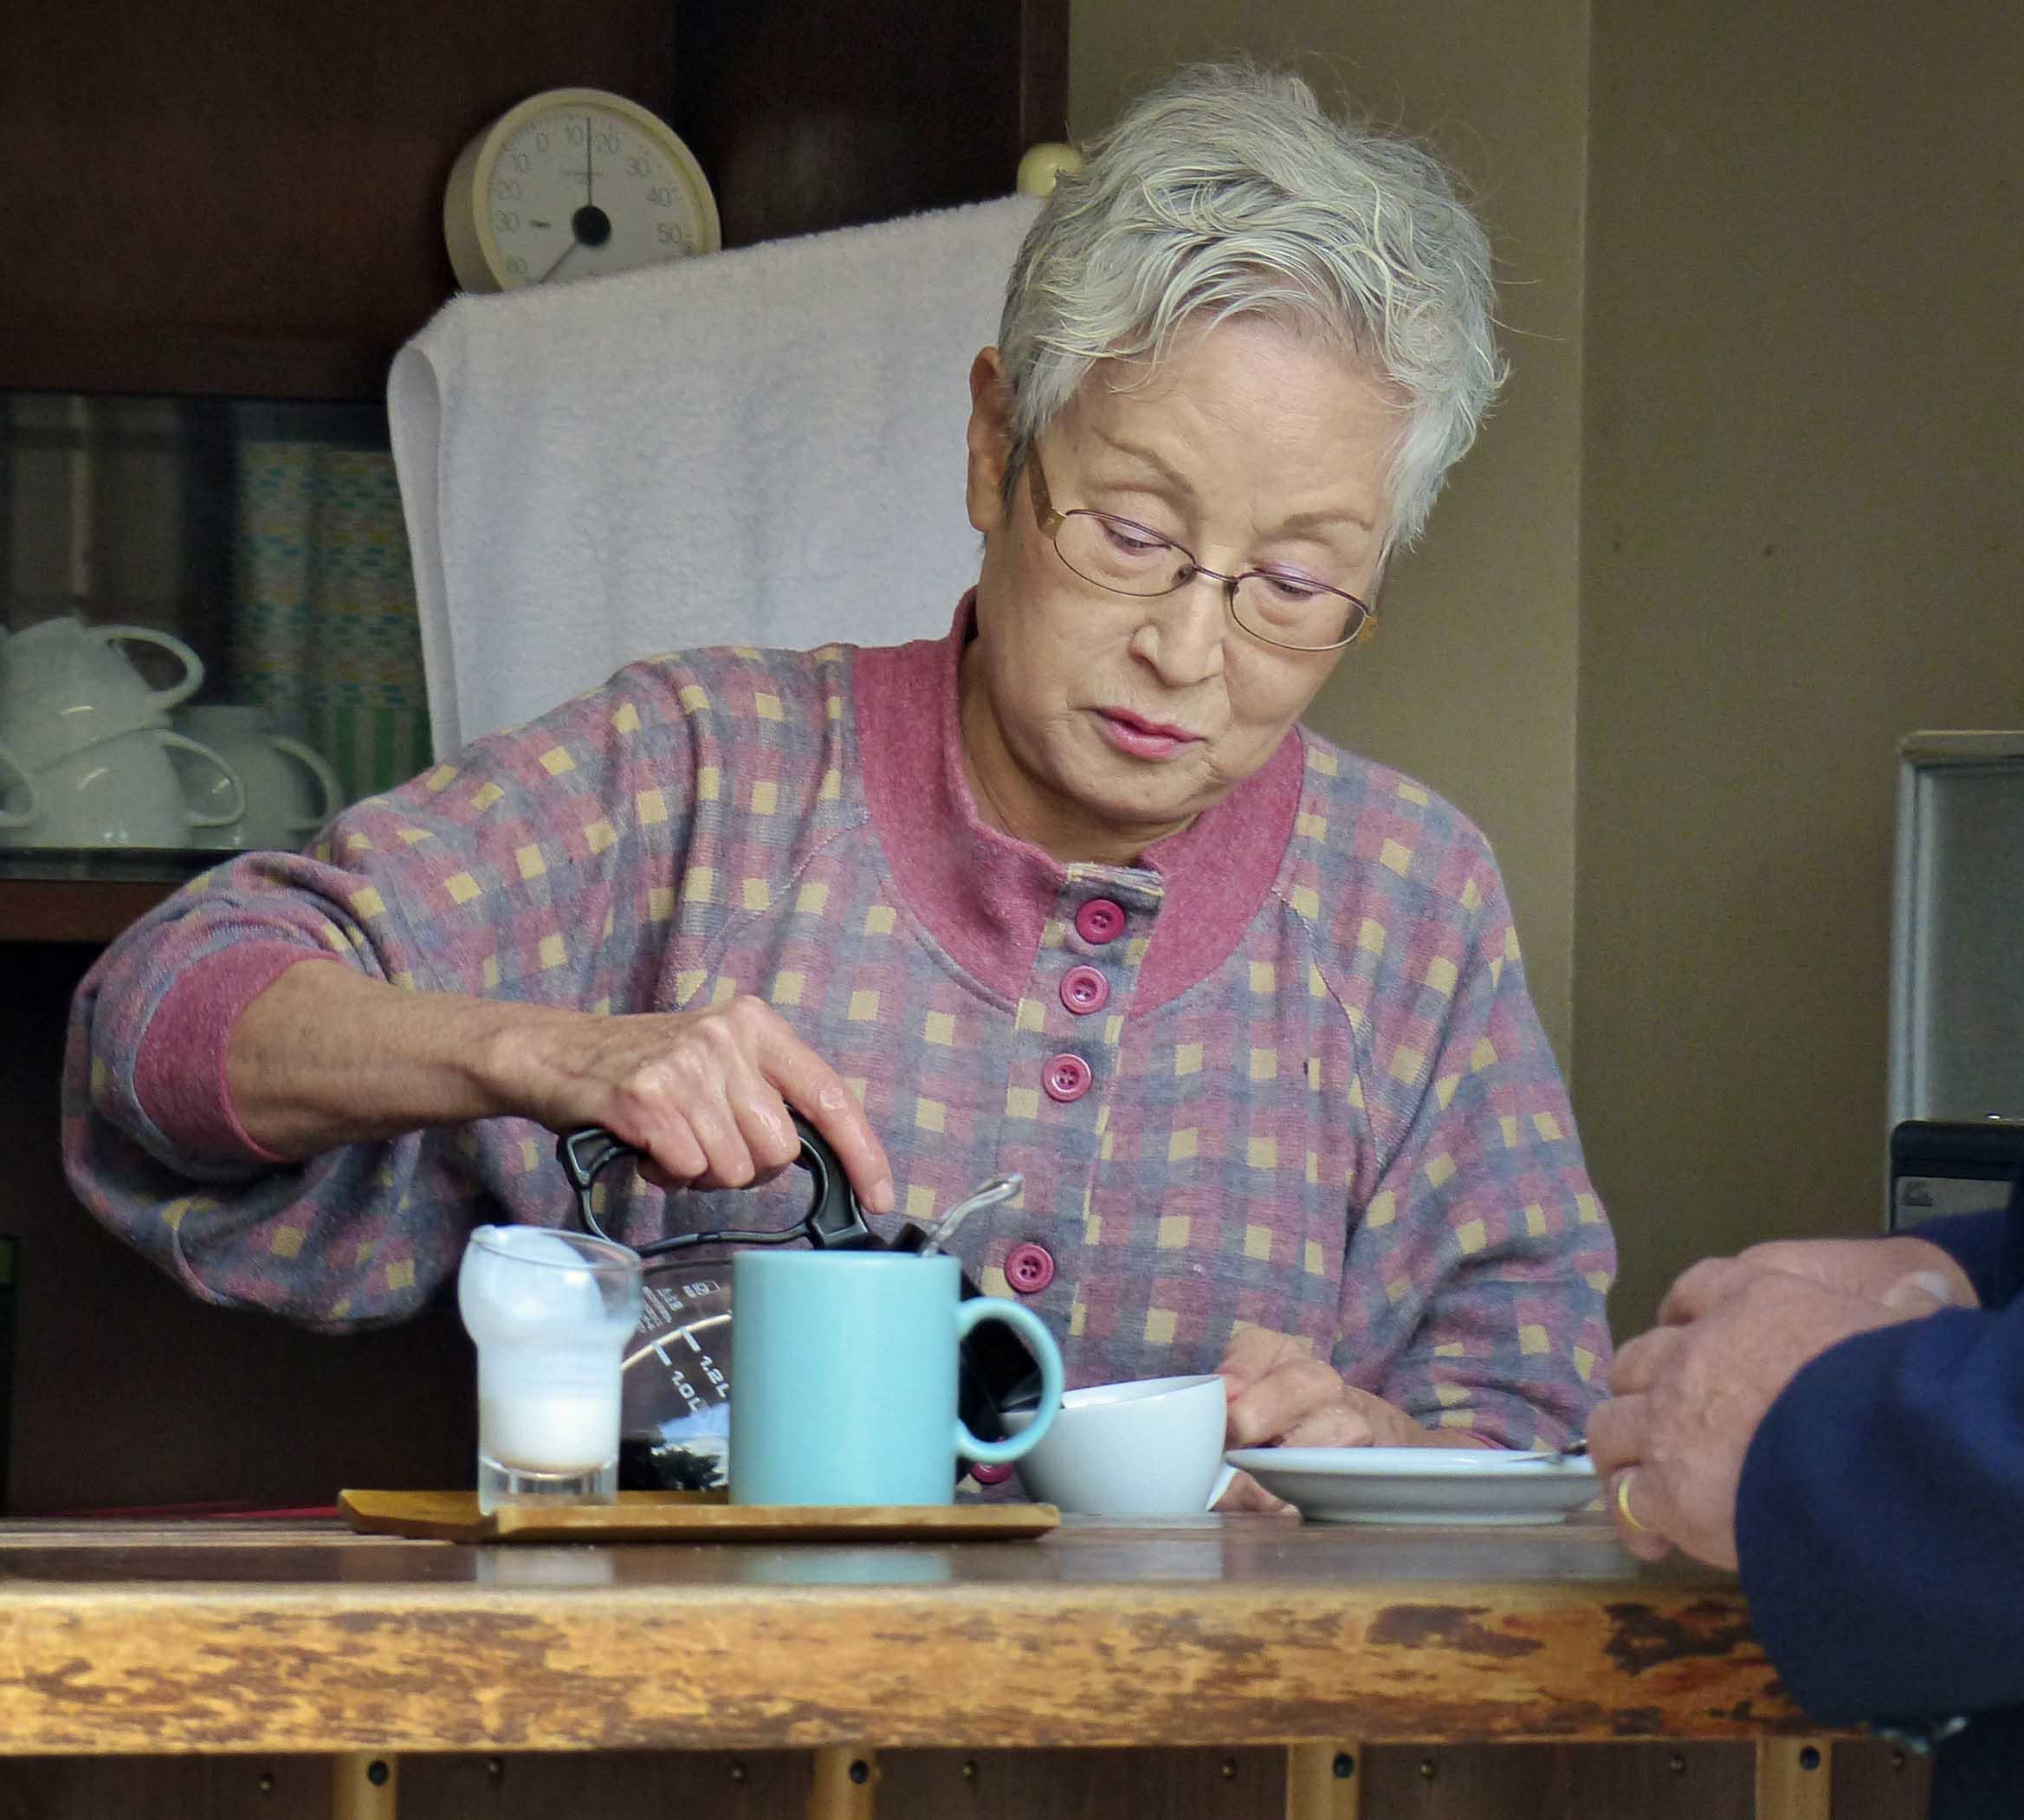 Lady pouring tea